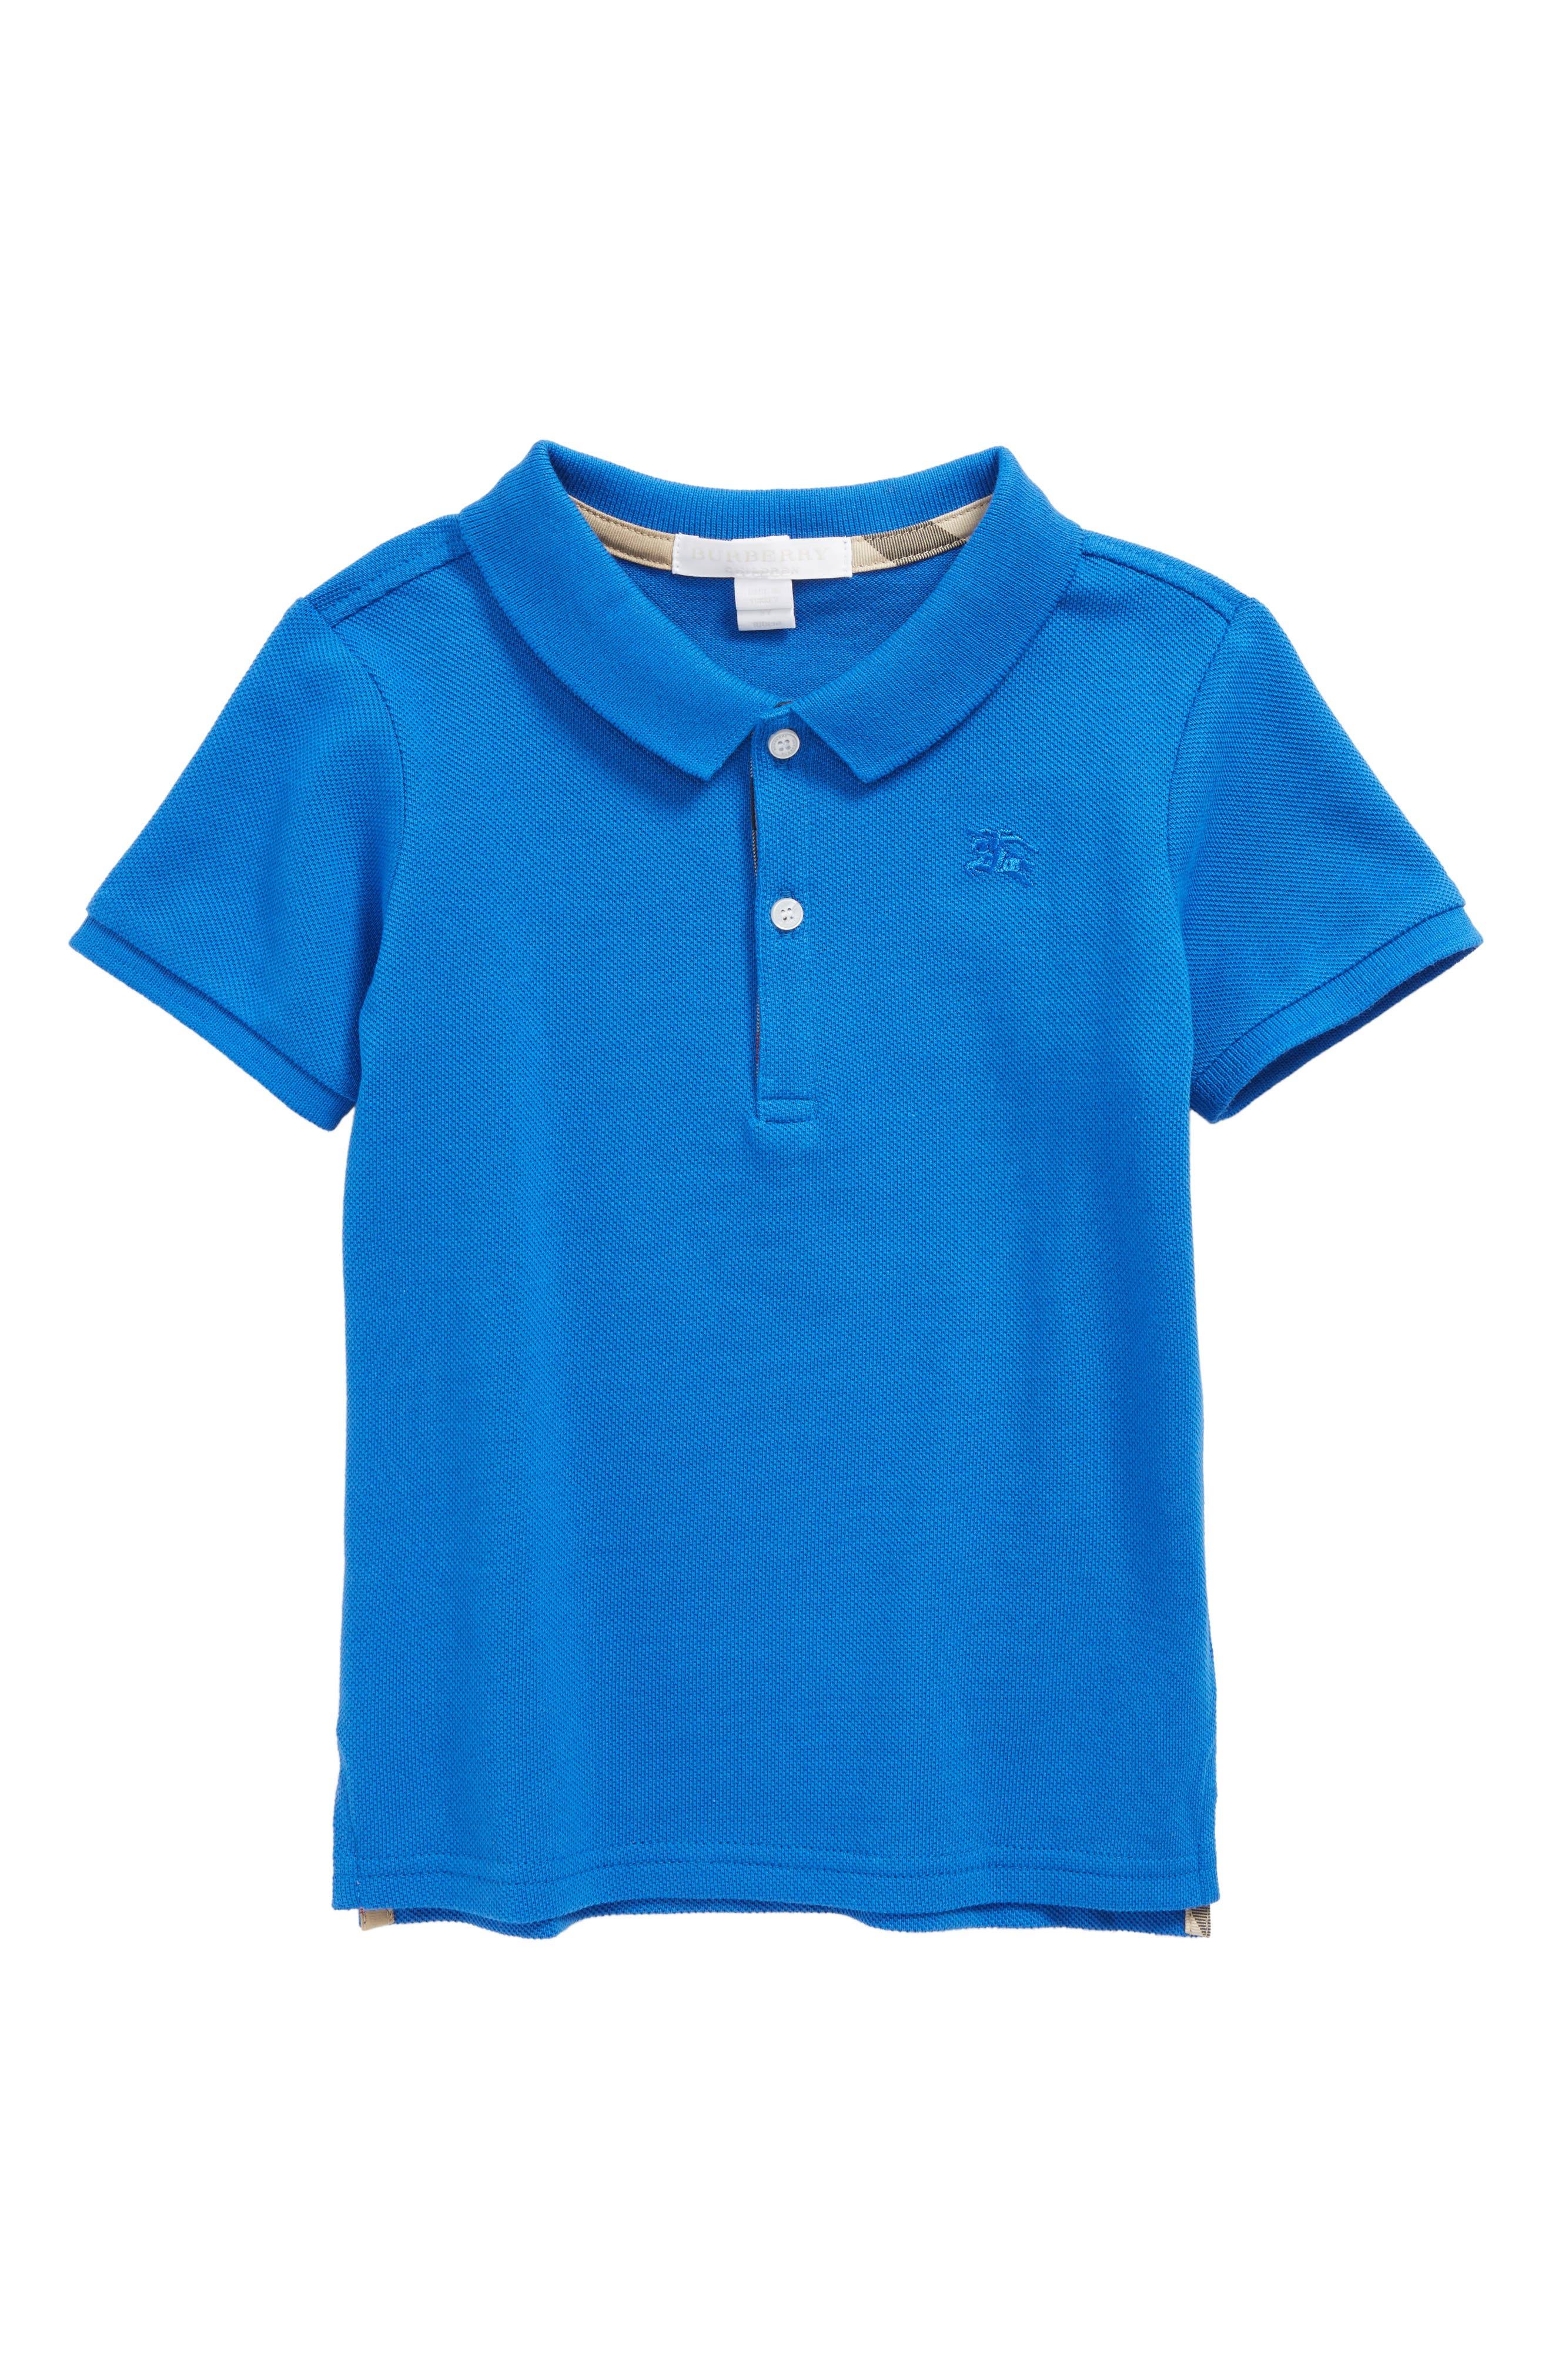 Palmer Piqué Polo,                         Main,                         color, Cobalt Blue